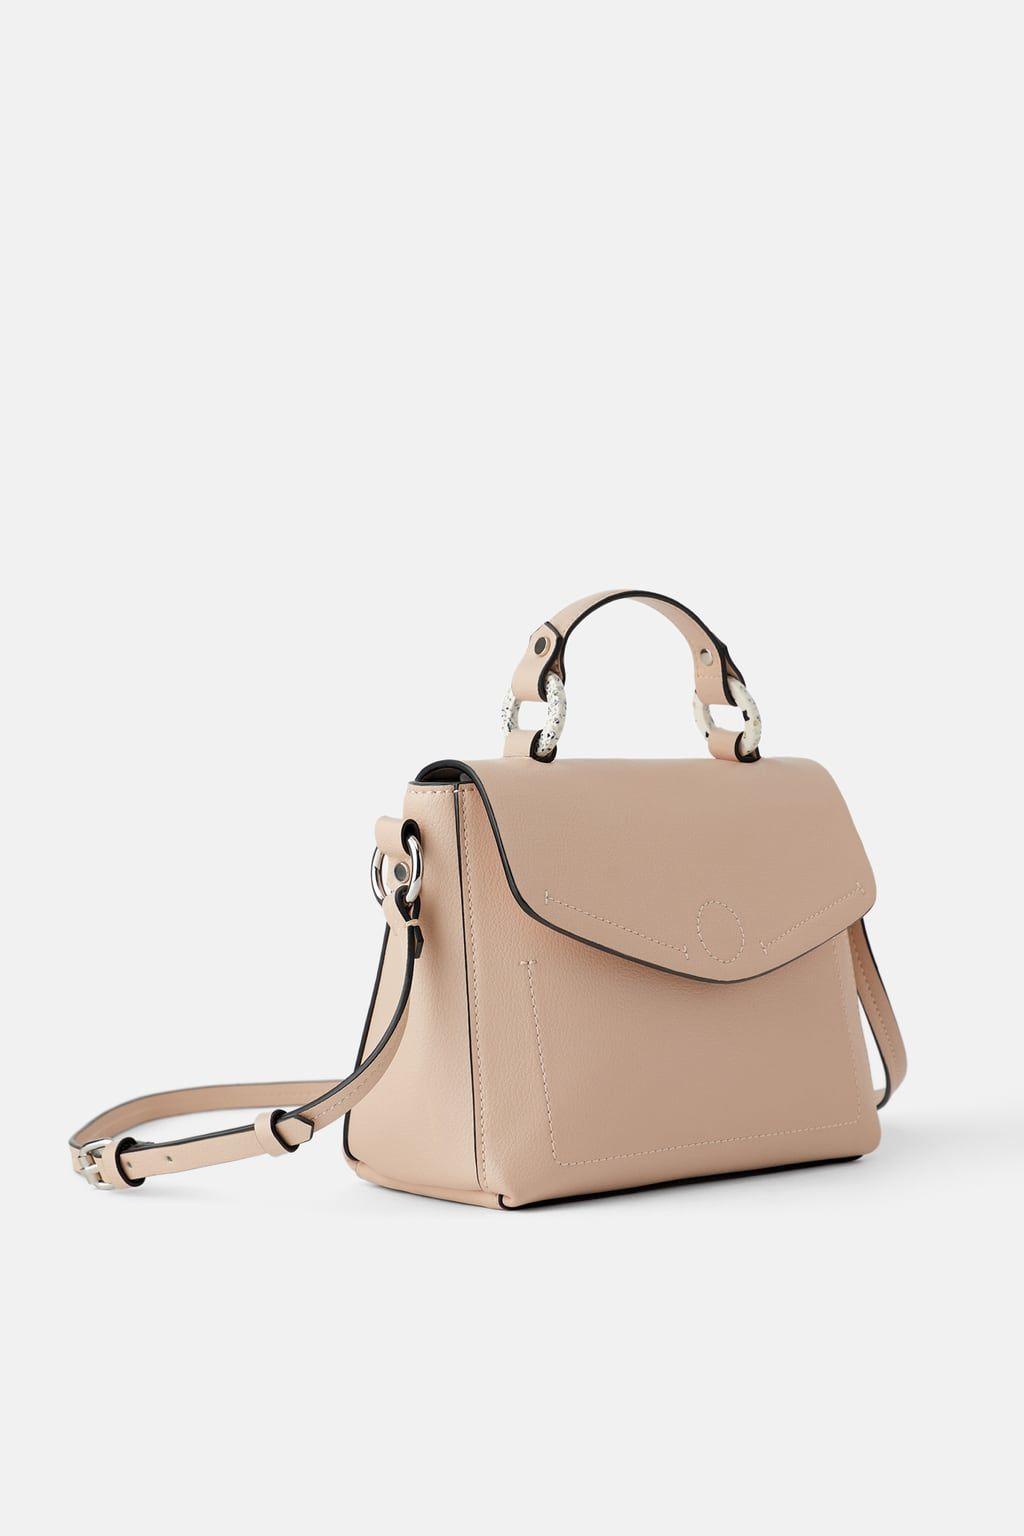 ZARA Women's Bags: Shop Online Now | BUYMA